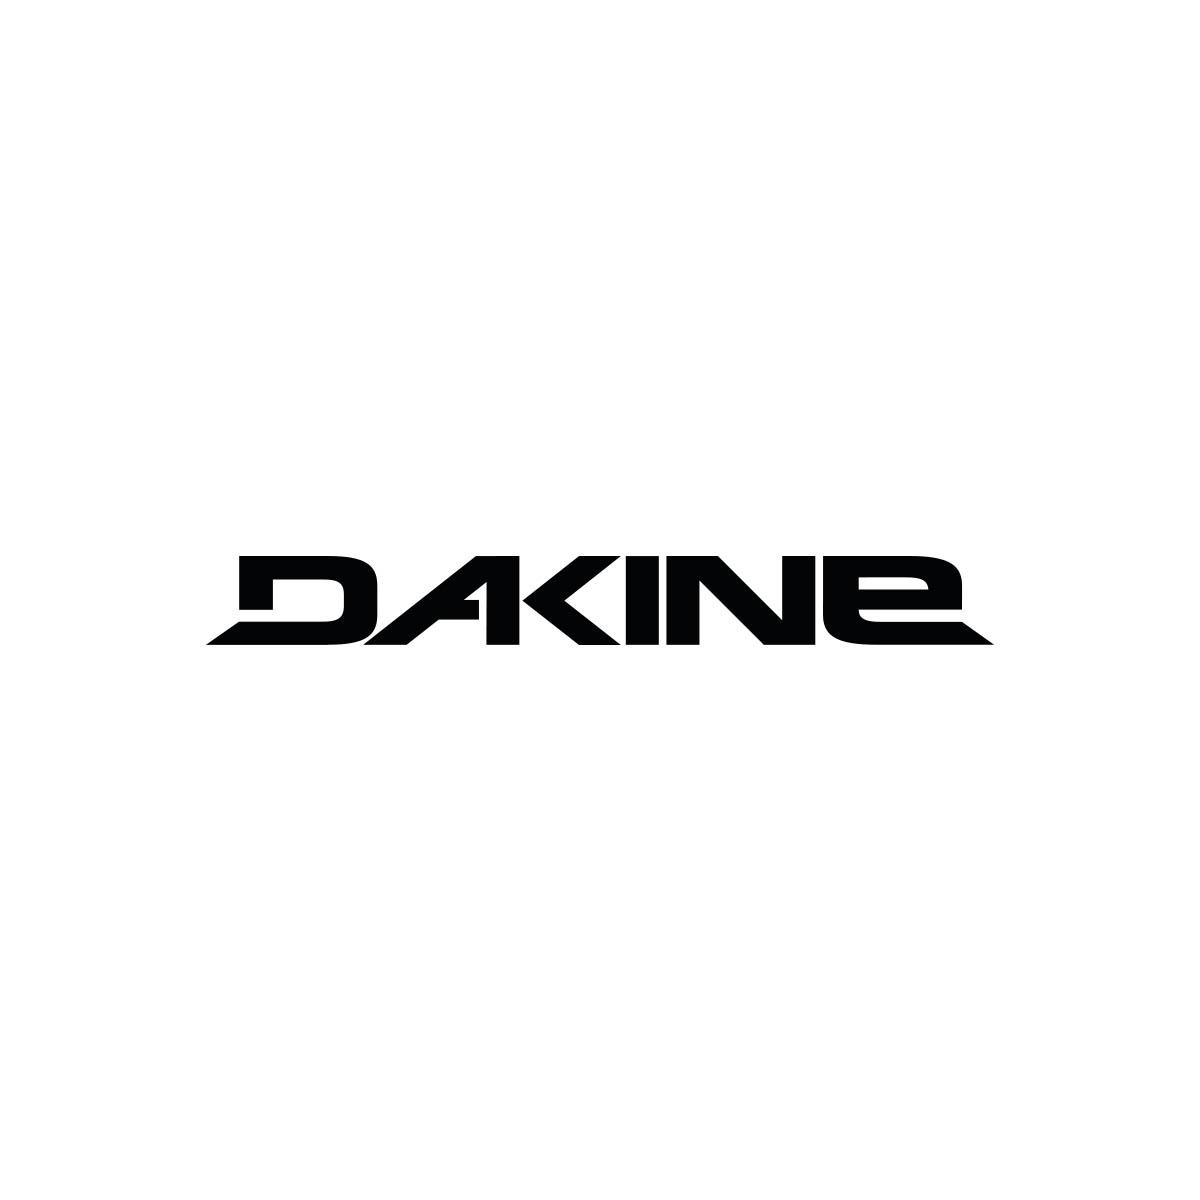 Dakine Letters Aufkleber Black   Dakine Shop